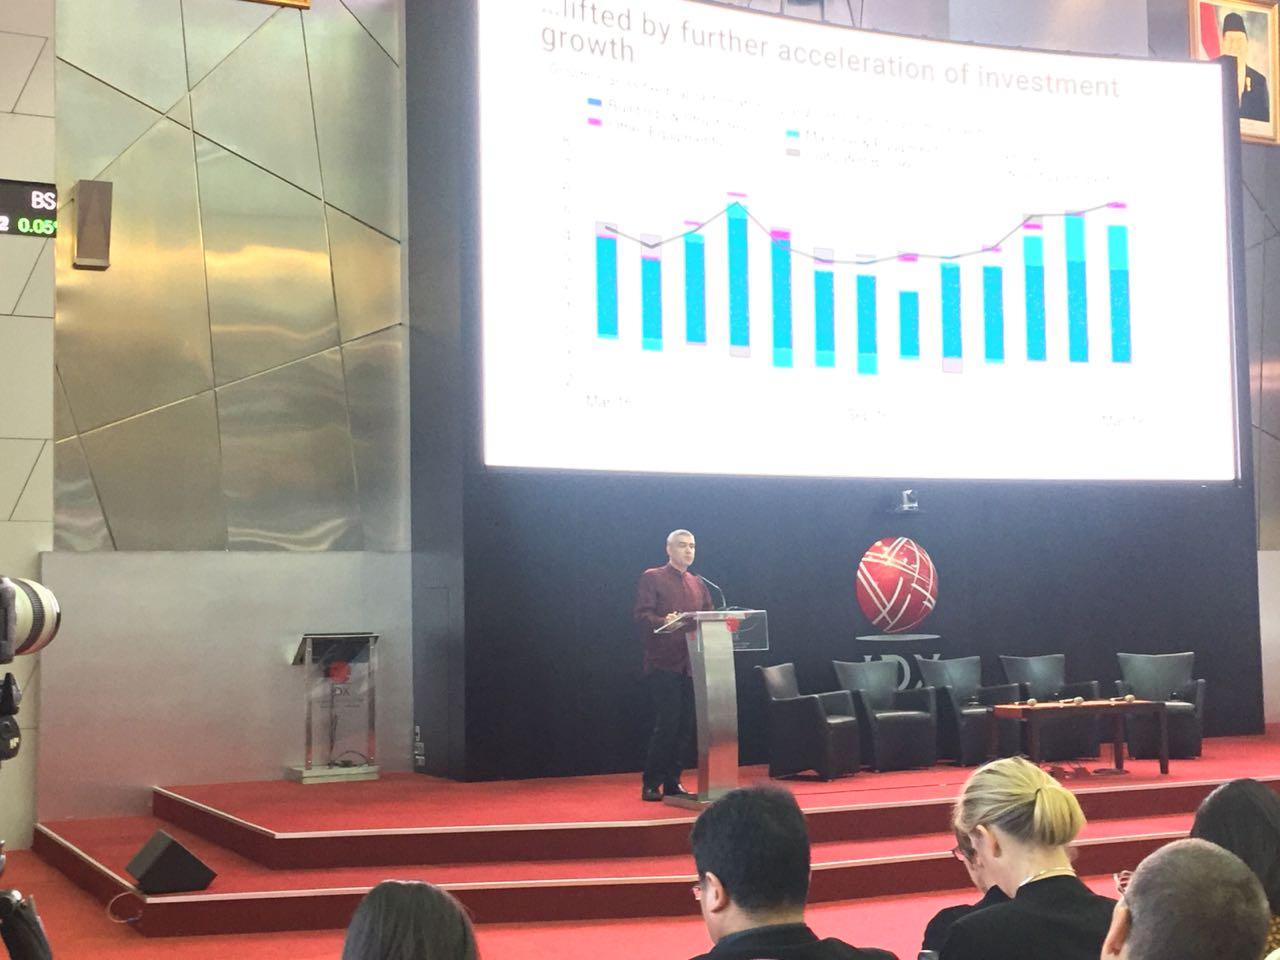 https: img-o.okeinfo.net content 2018 06 06 20 1907257 bank-dunia-sebut-ekonomi-indonesia-tumbuh-cepat-di-triwulan-pertama-5HBJuqZsJw.jpeg